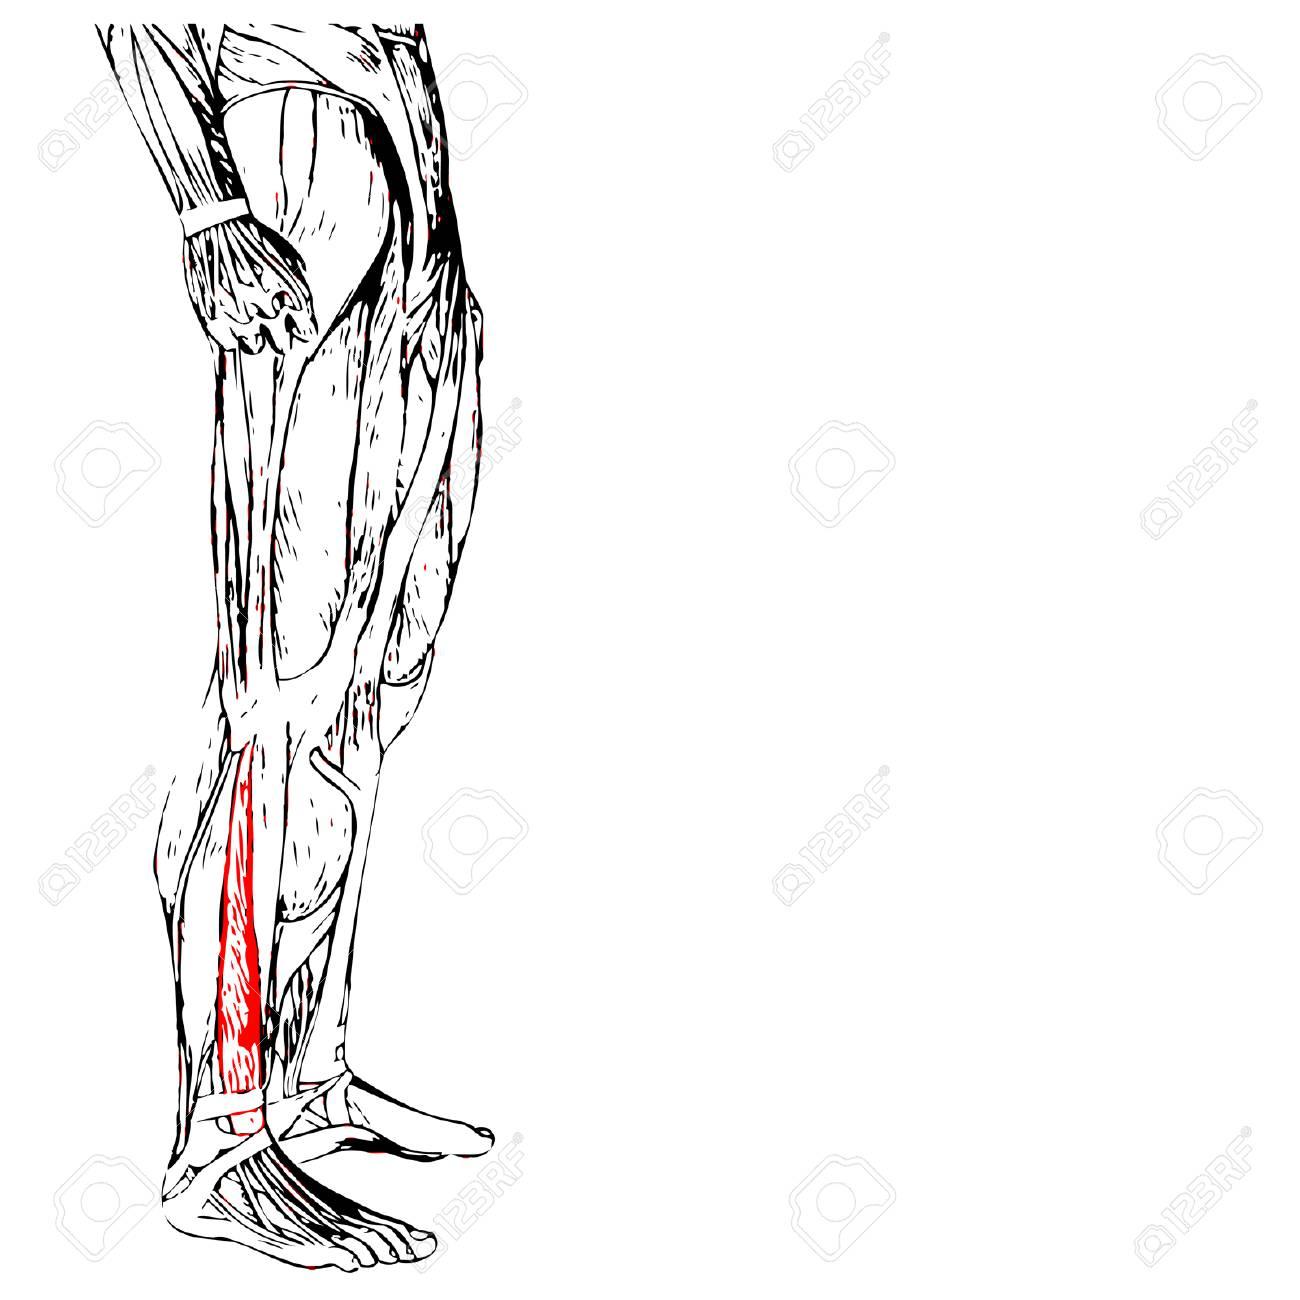 Concepto O Humano Conceptual 3D Anatomía Inferior De La Pierna O ...